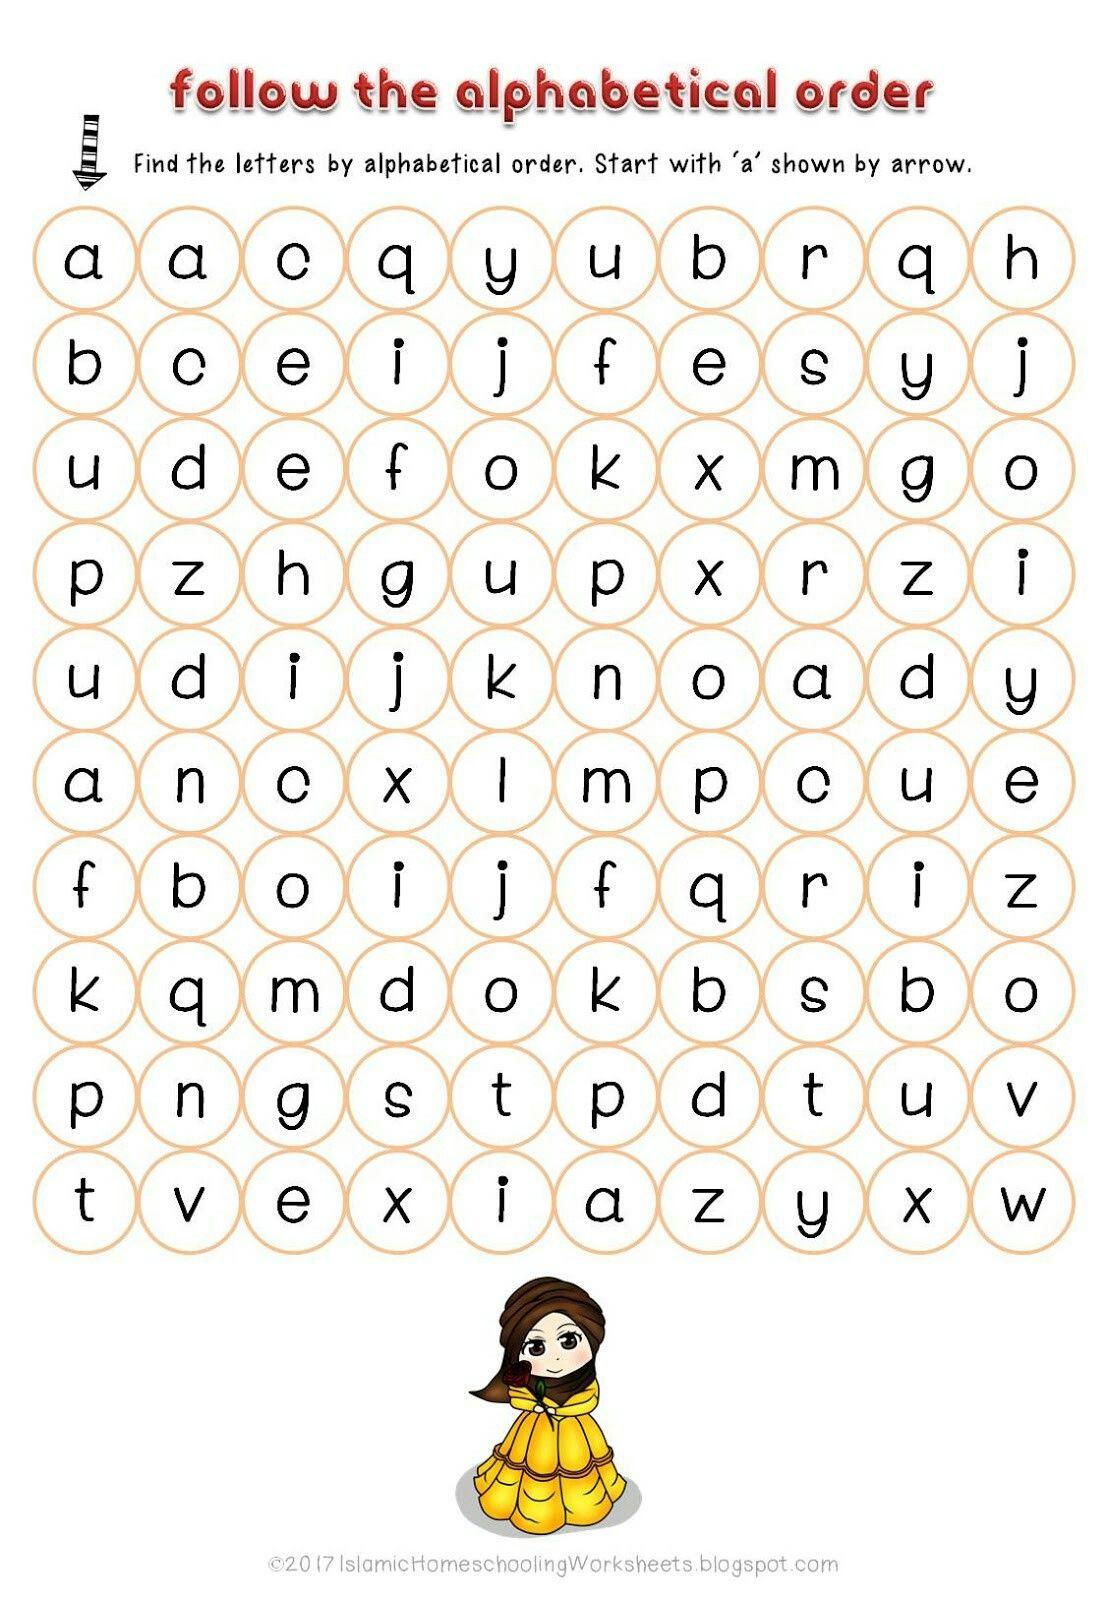 Follow The Alphabetical Order In Free Disney Princess